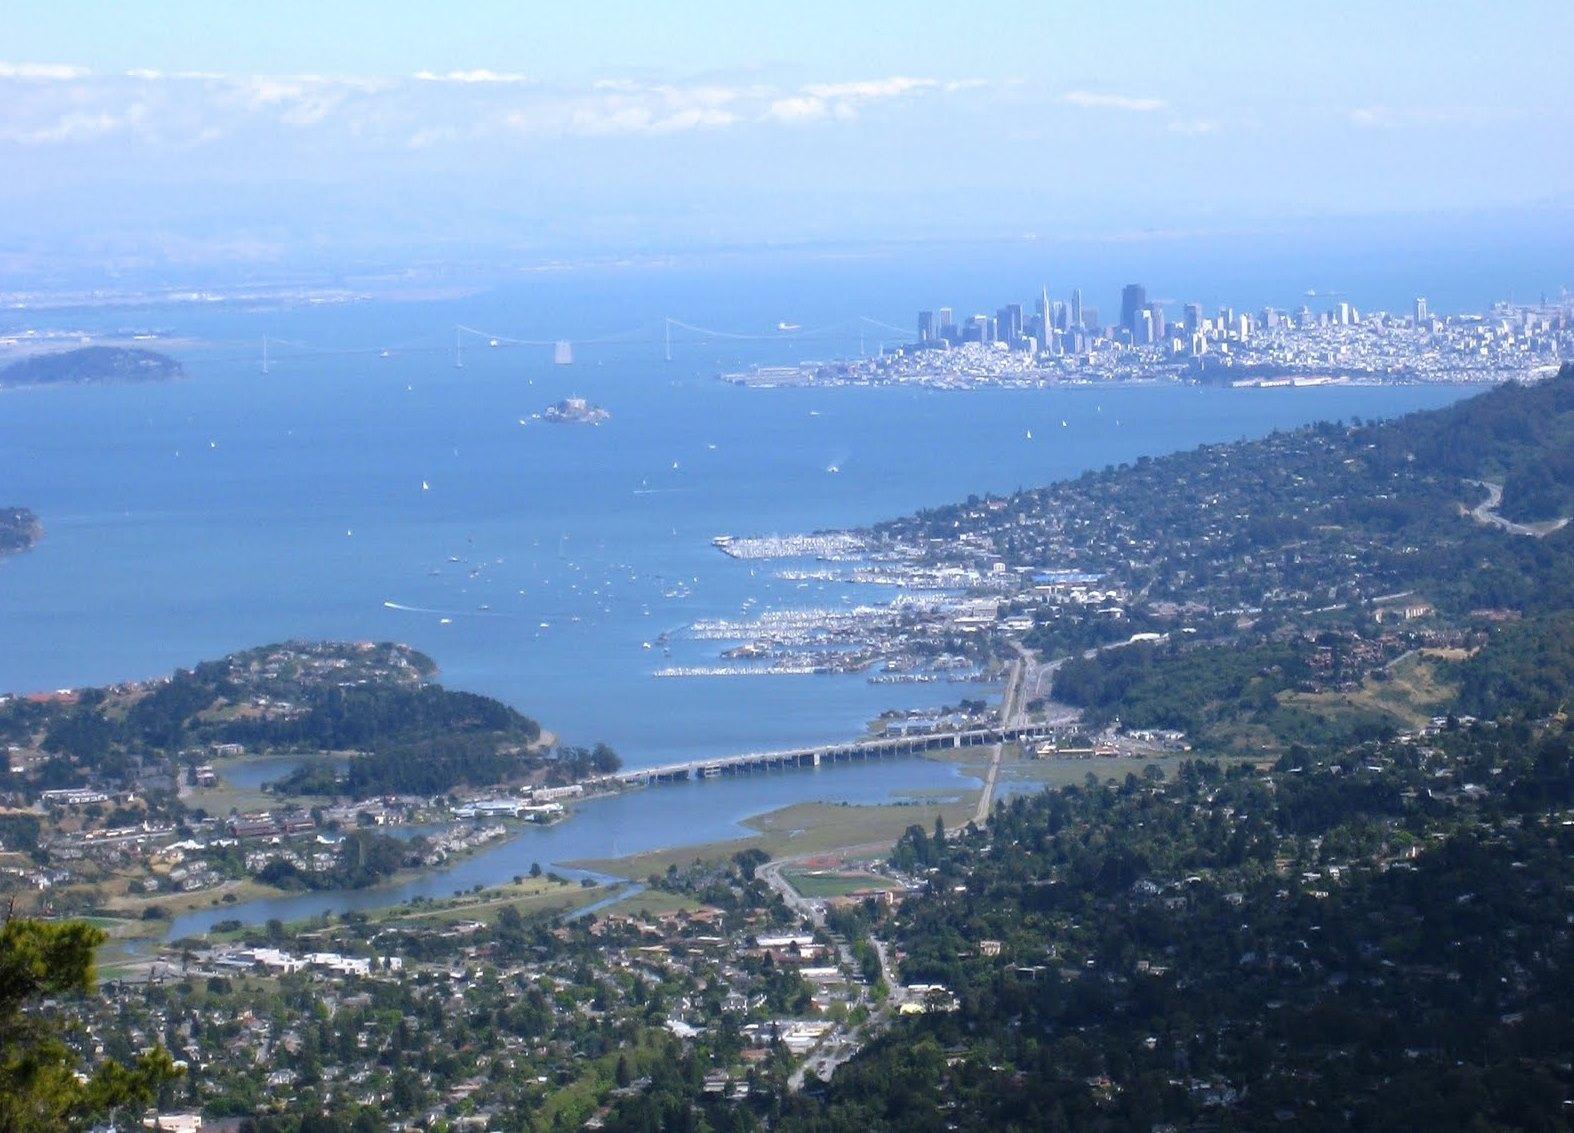 Marin County Redwood Appraisal